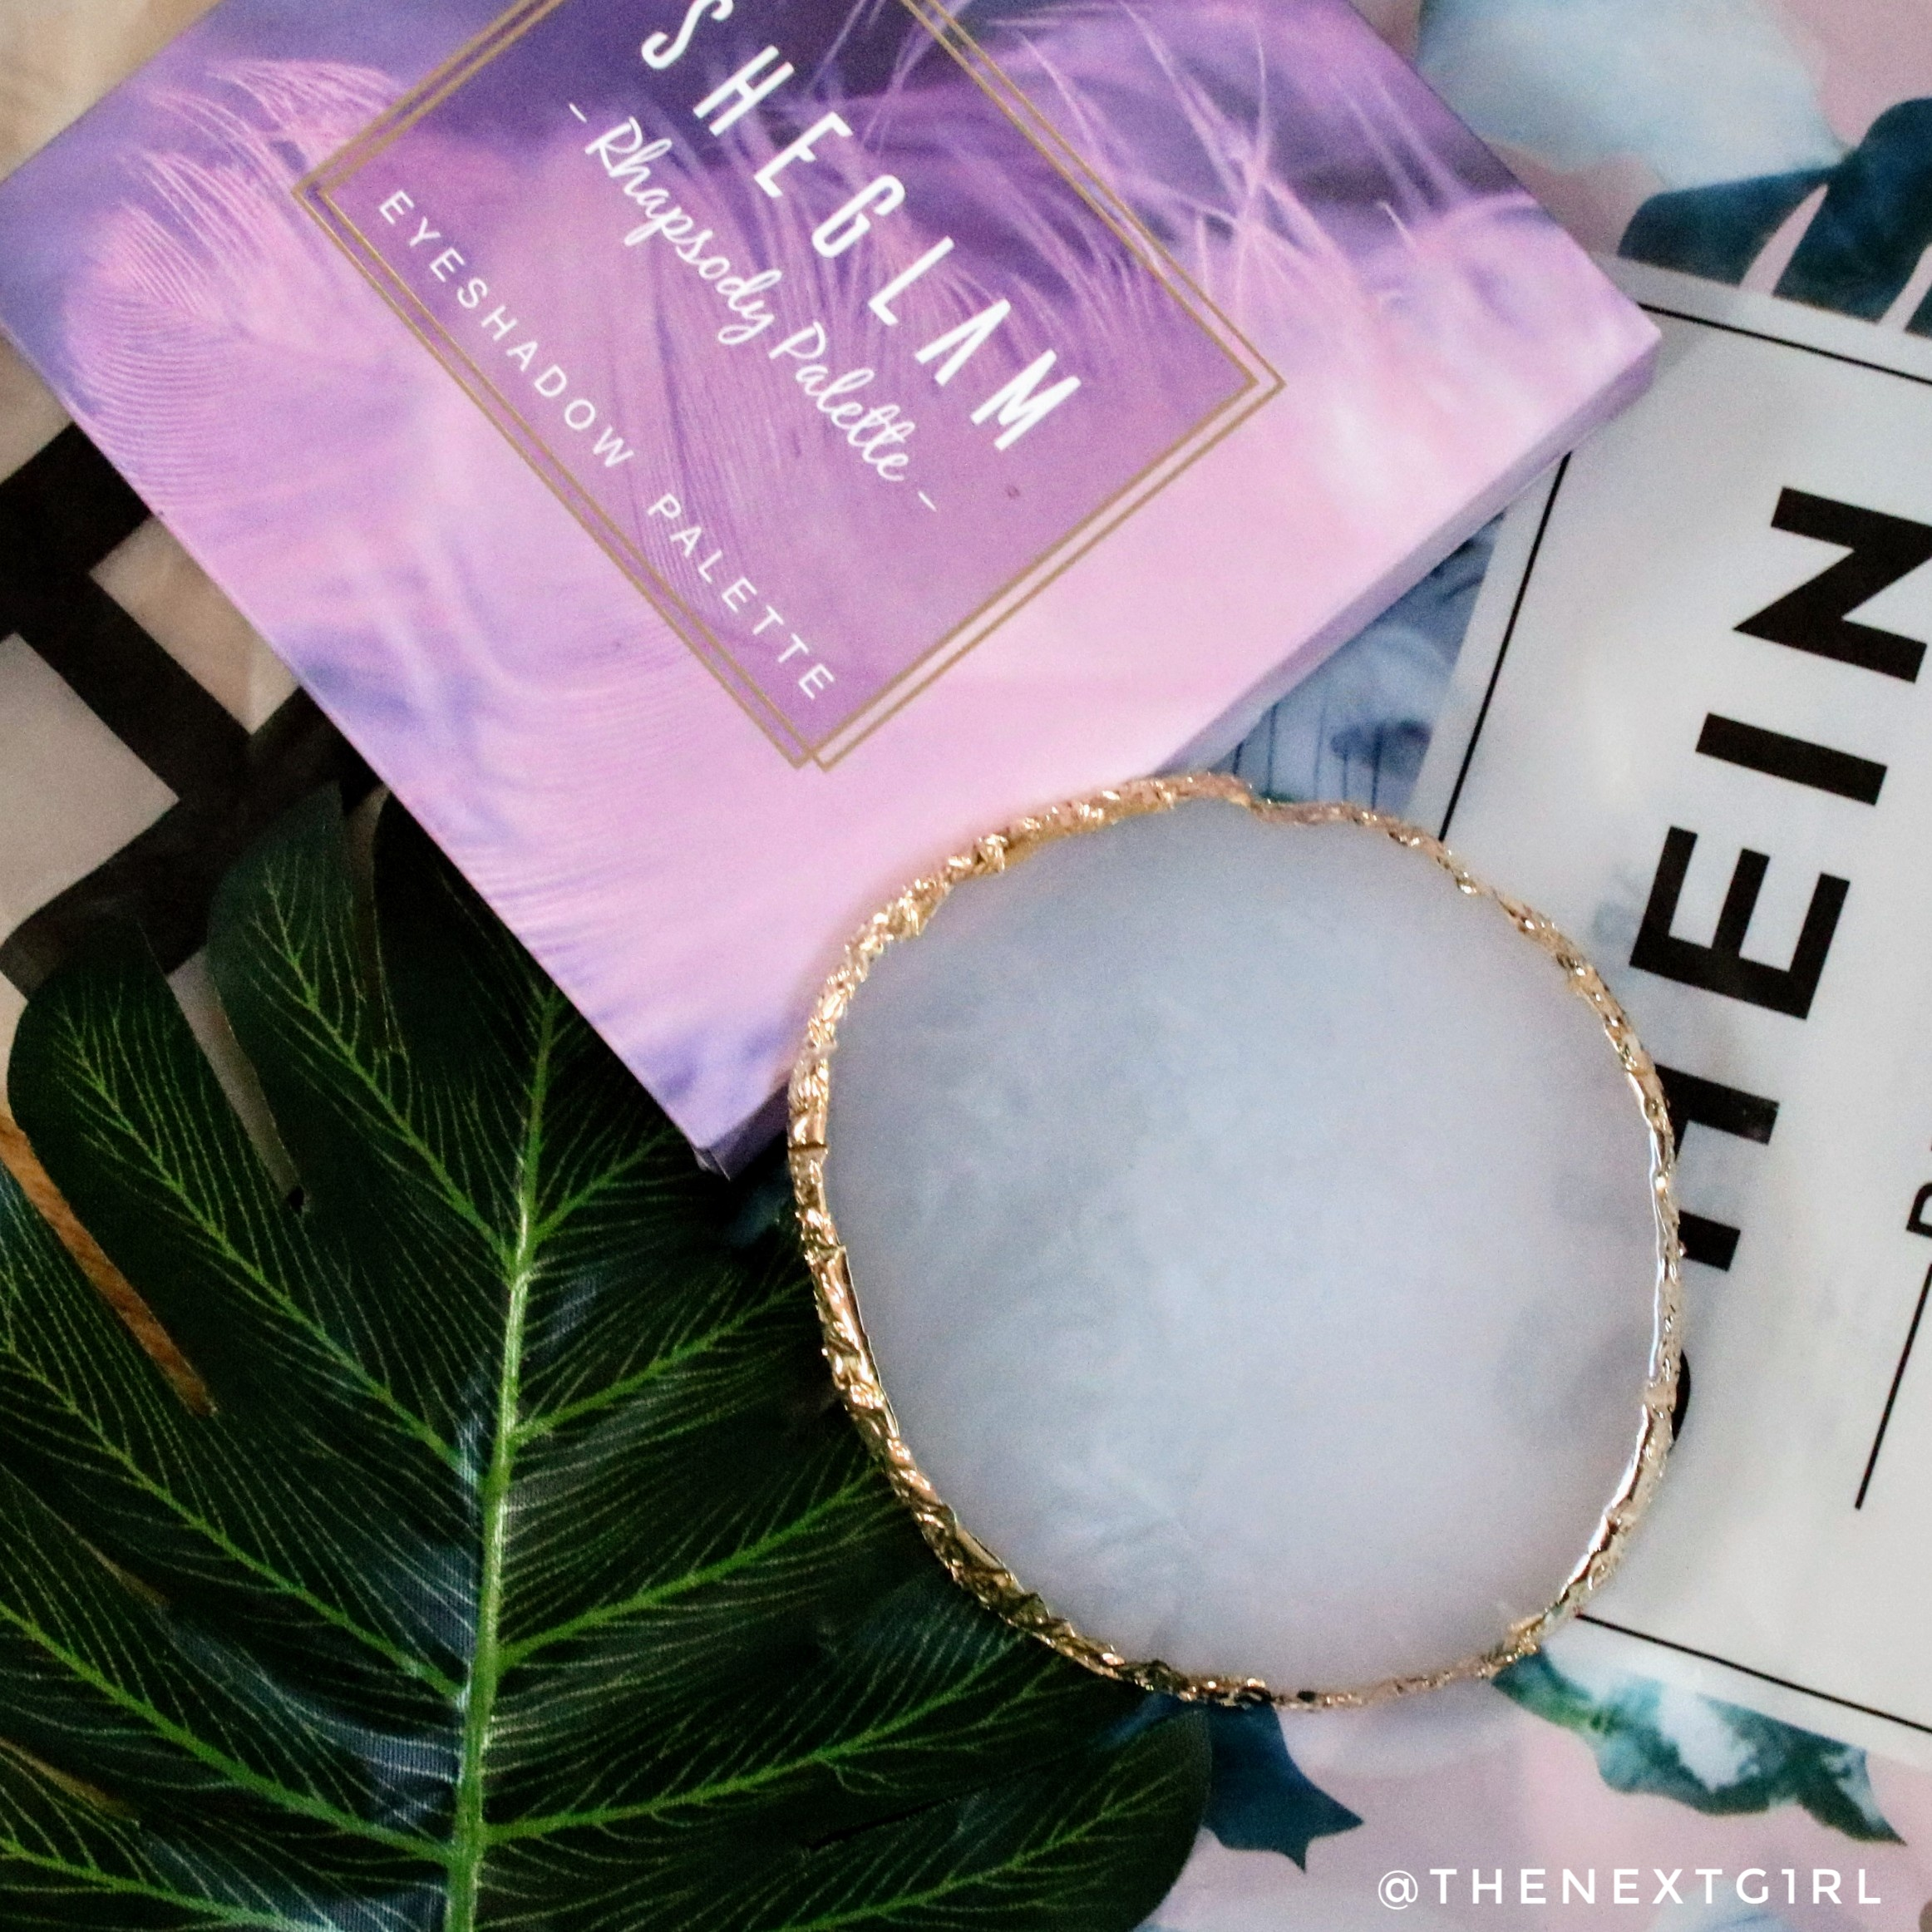 SHEIN shoplog november 2020